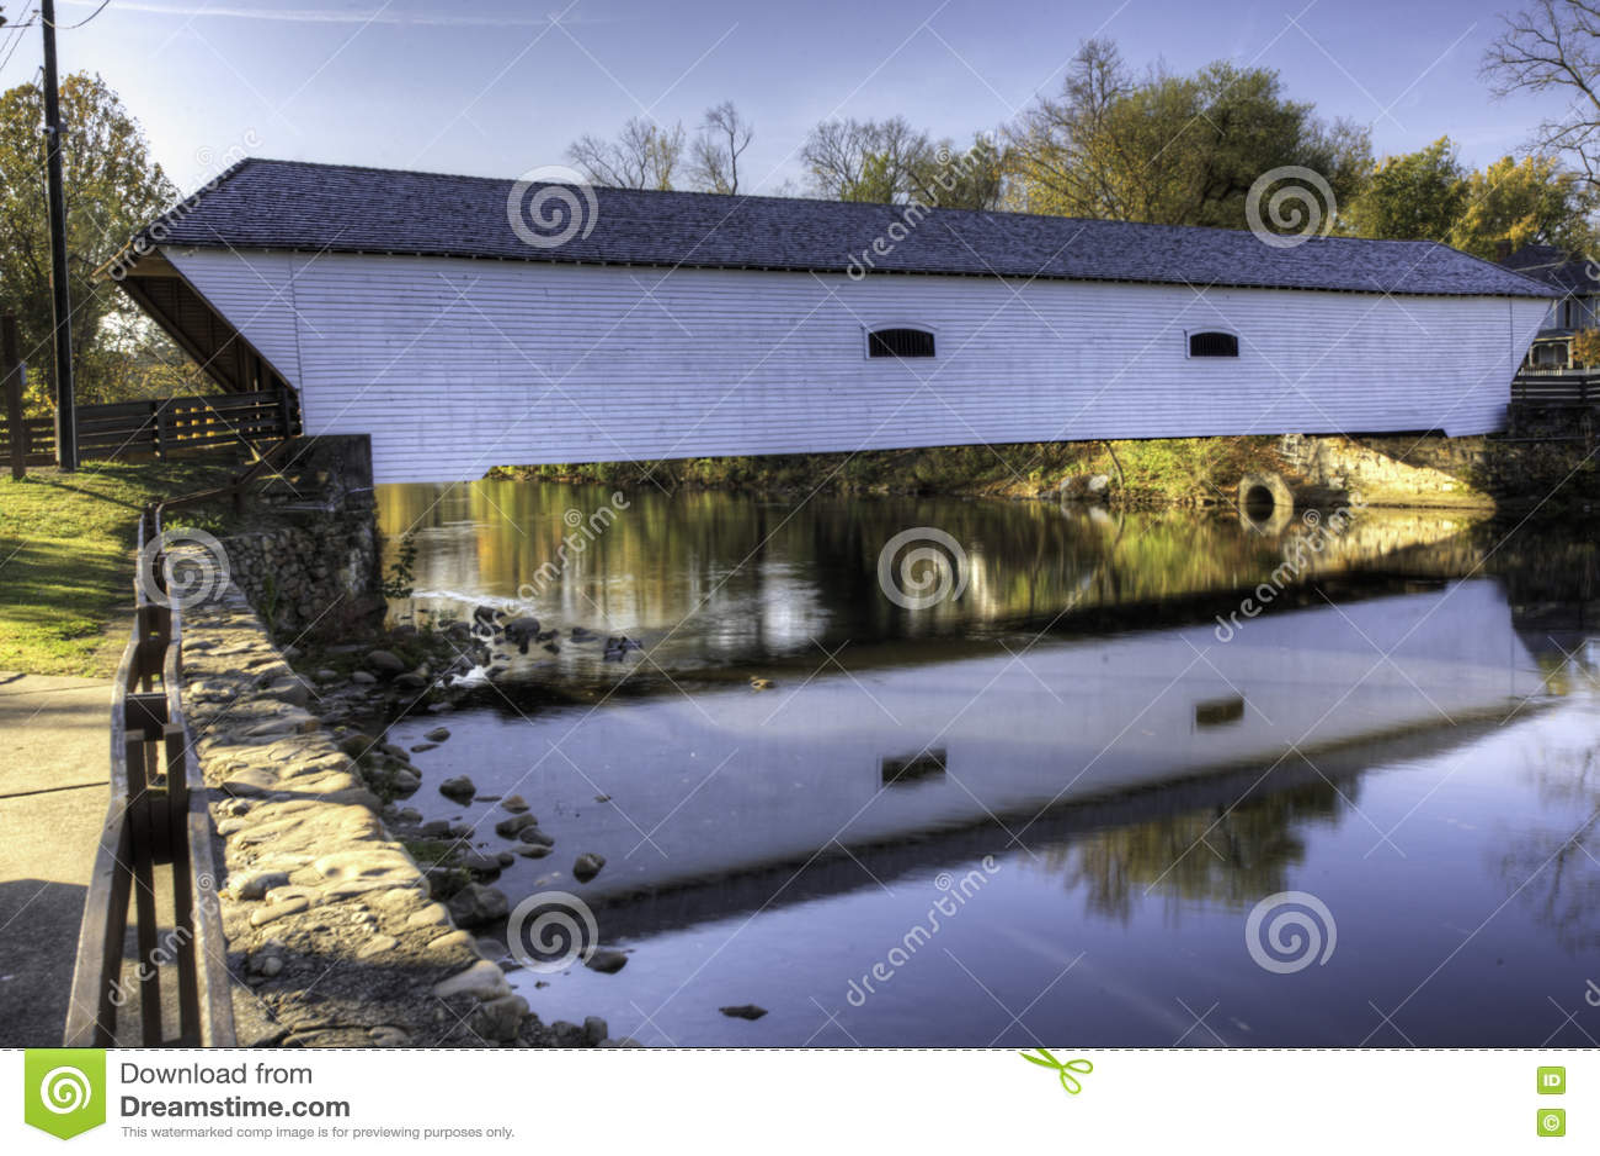 Elizabethton Covered Bridge in Tennessee